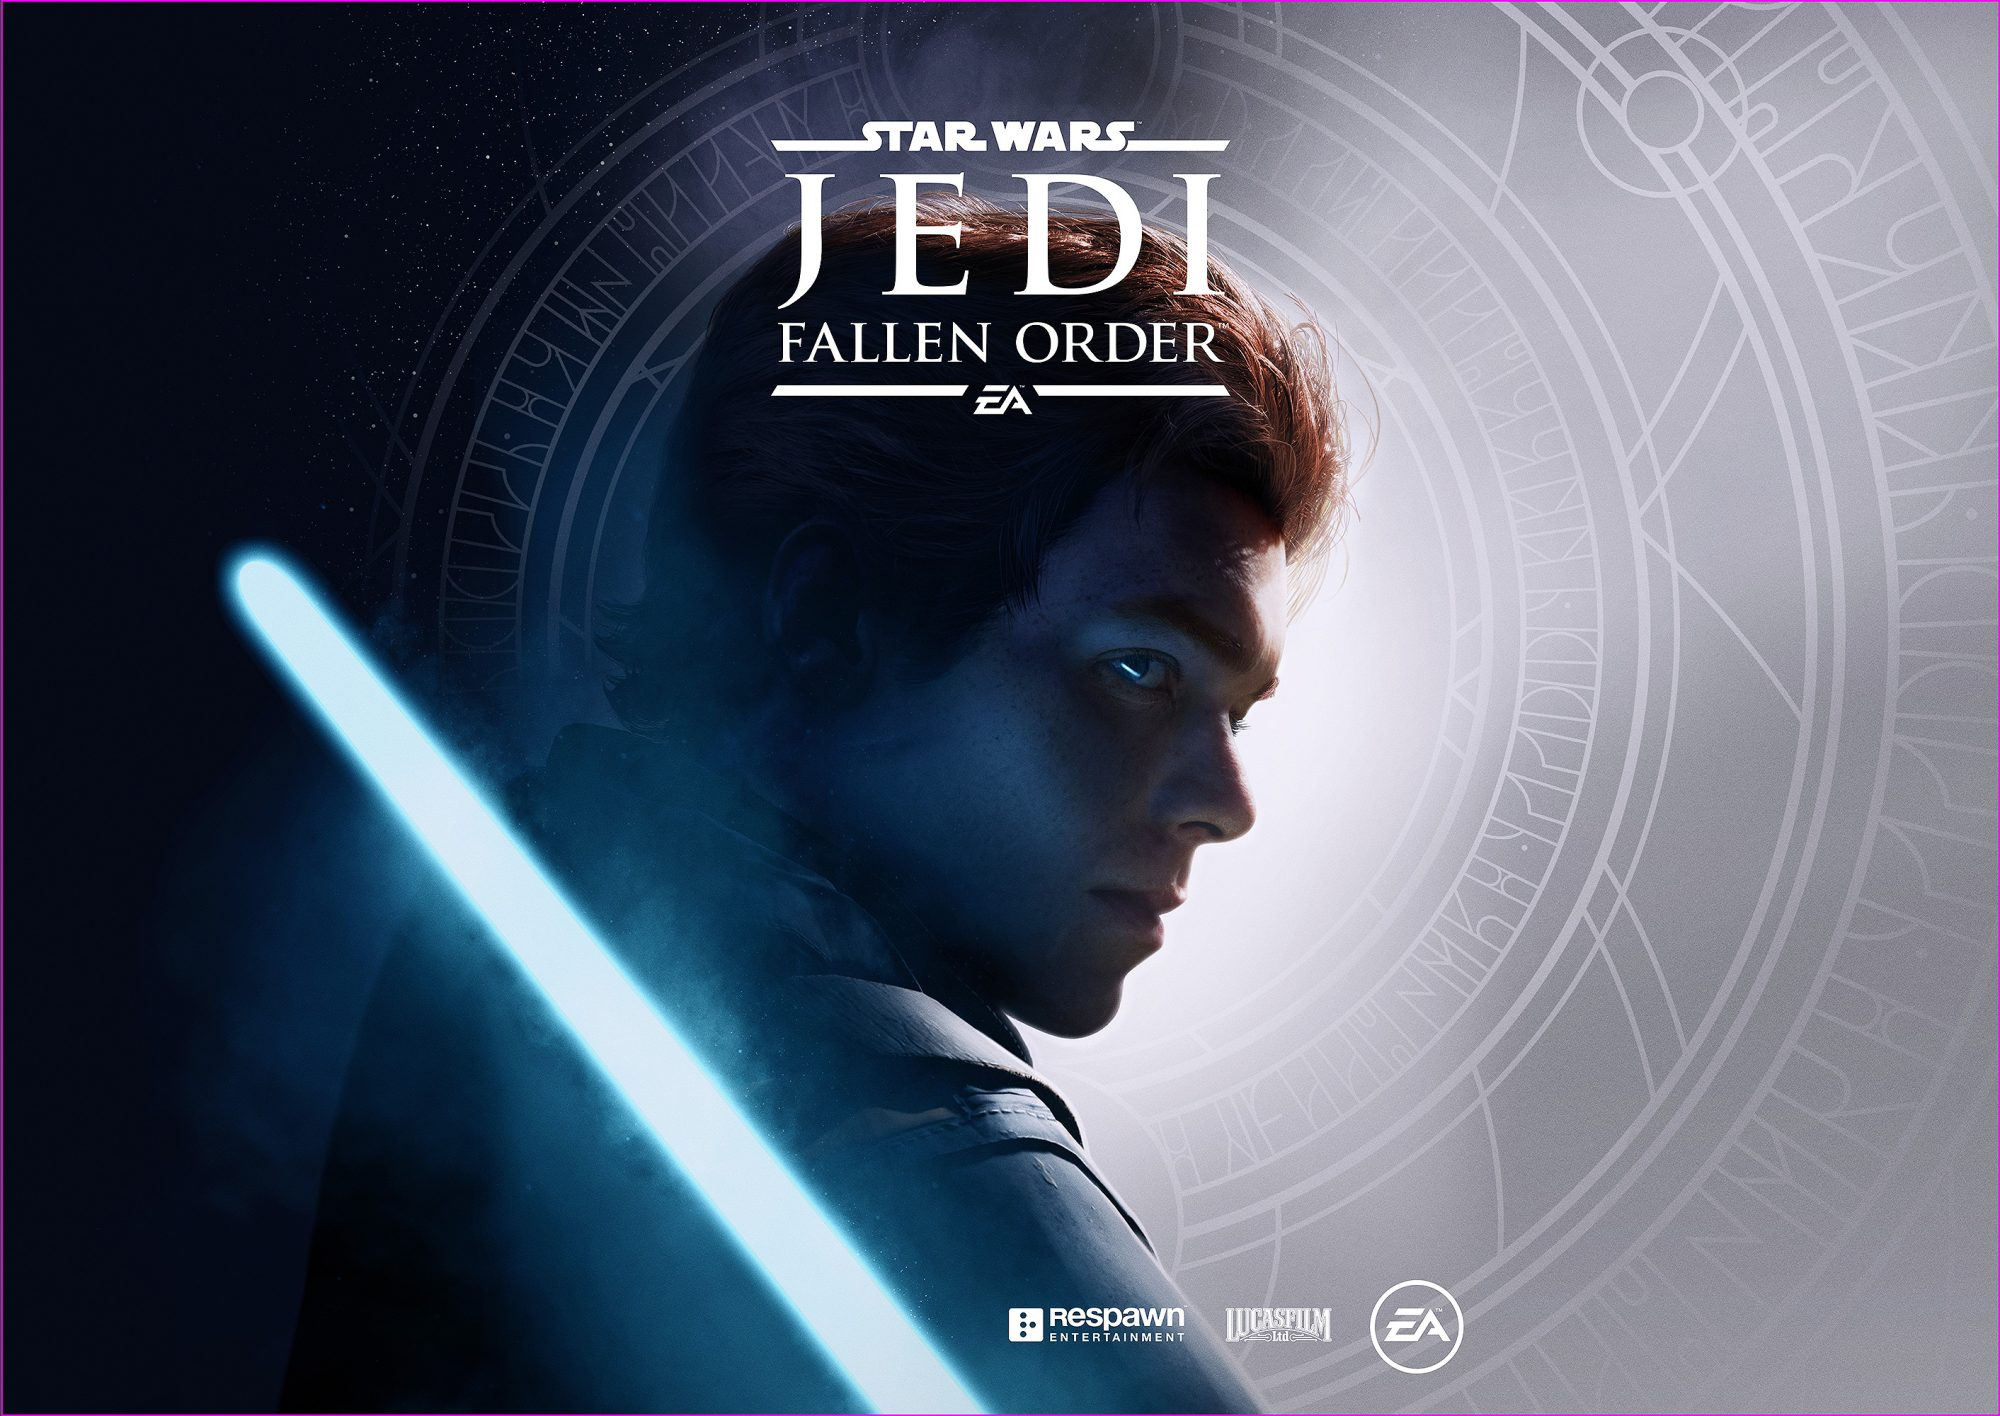 Star Wars Jedi: Fallen Order director.